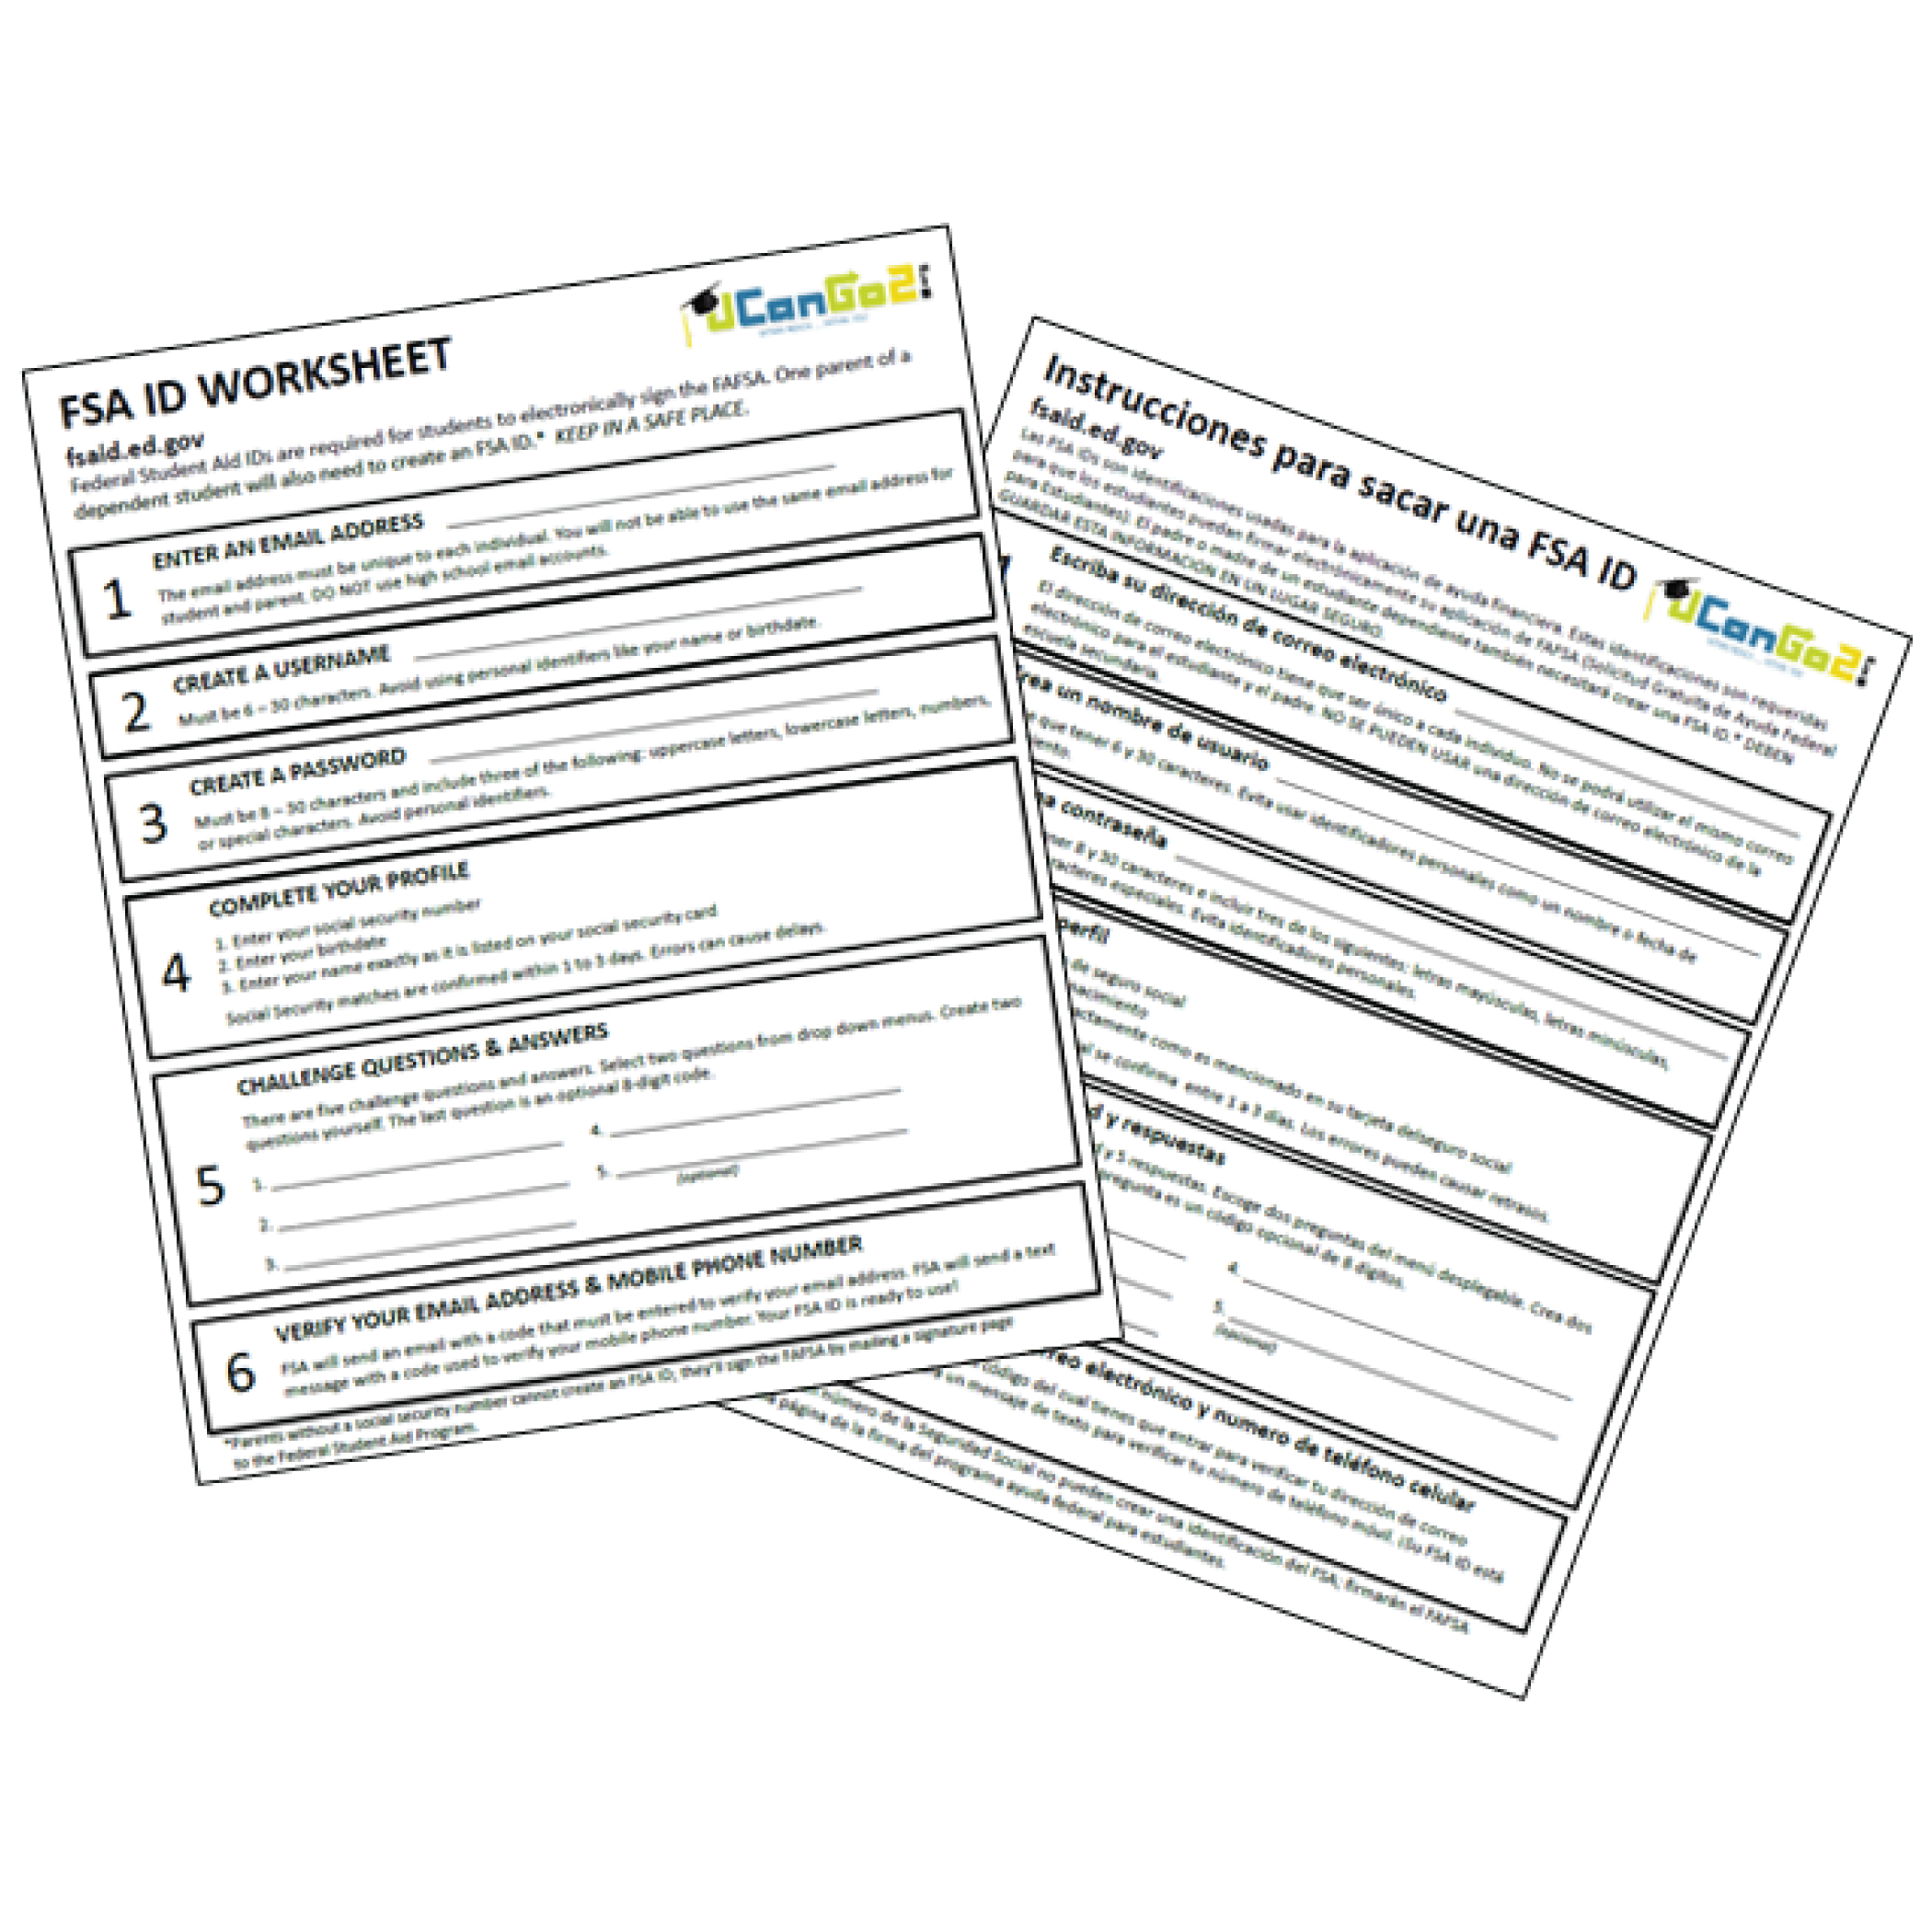 FSA ID Worksheet Image